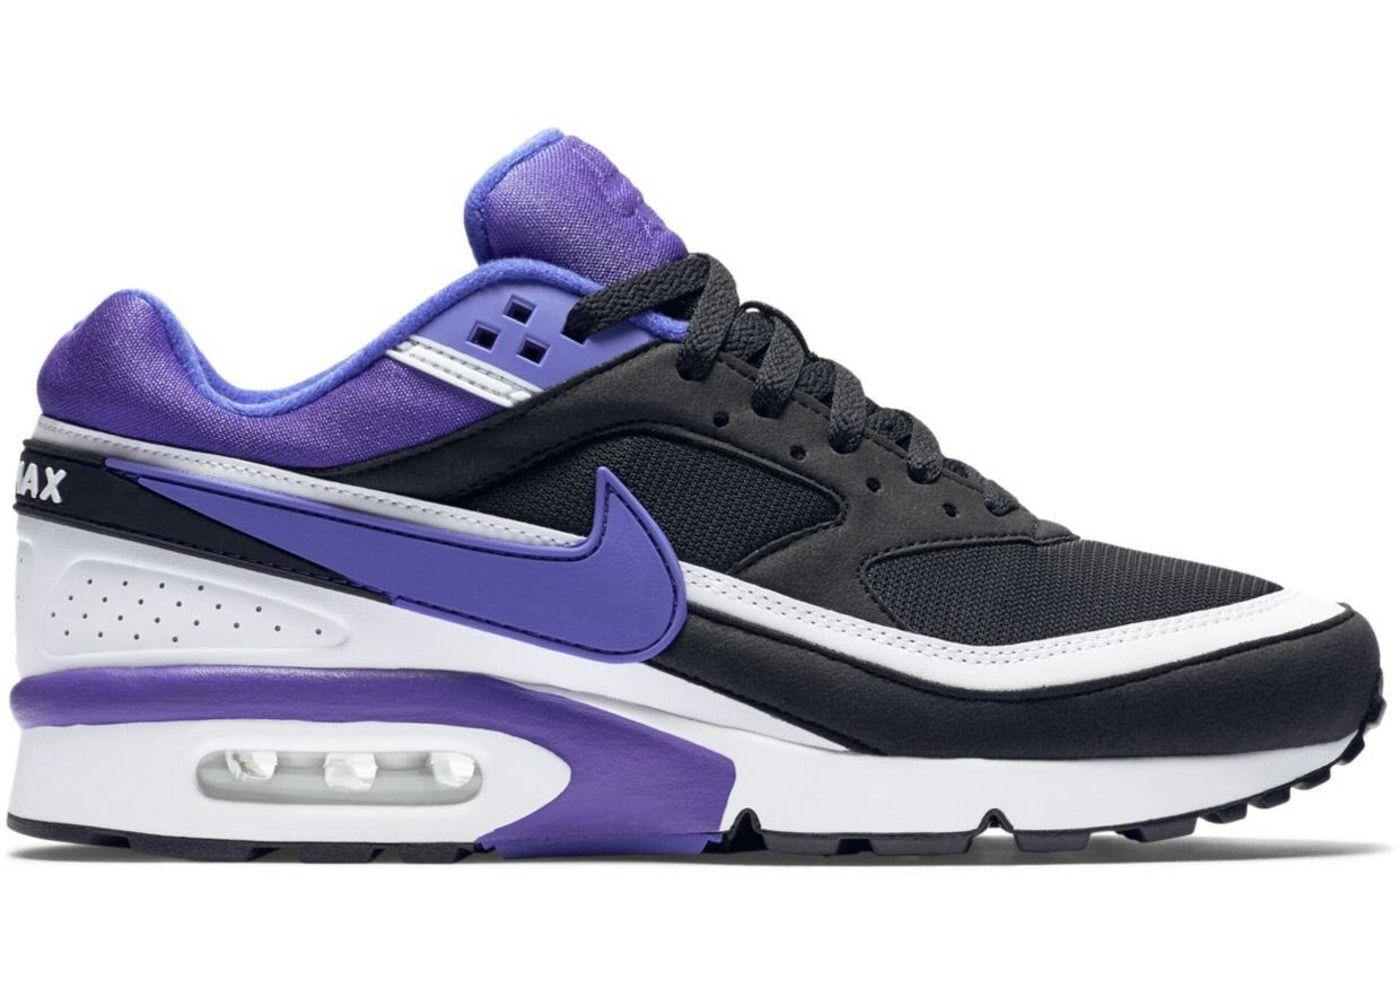 Cheap Nike Air Max BW Ultra Light Bone Shoes Women : NO1838